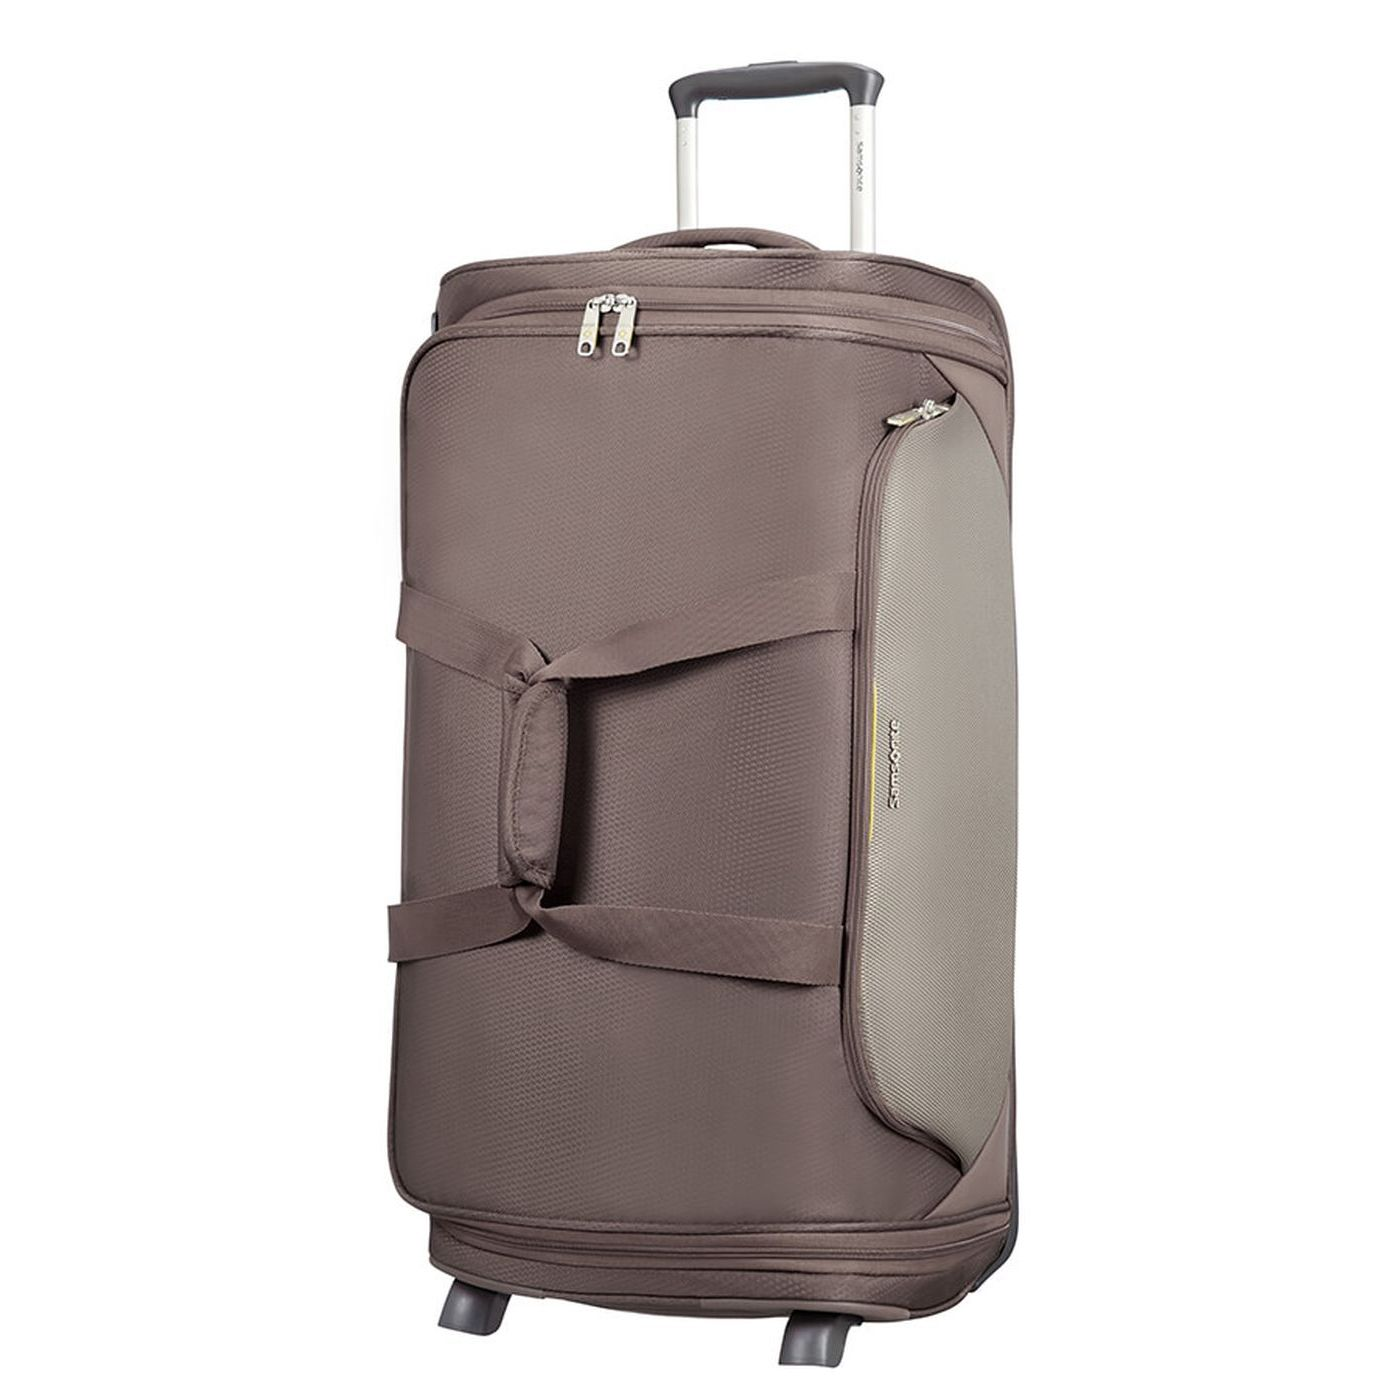 Cestovná taška Samsonite Dynamore Duffle wh 67 CH4 008 - INBAG.sk 6d3ff6d809d